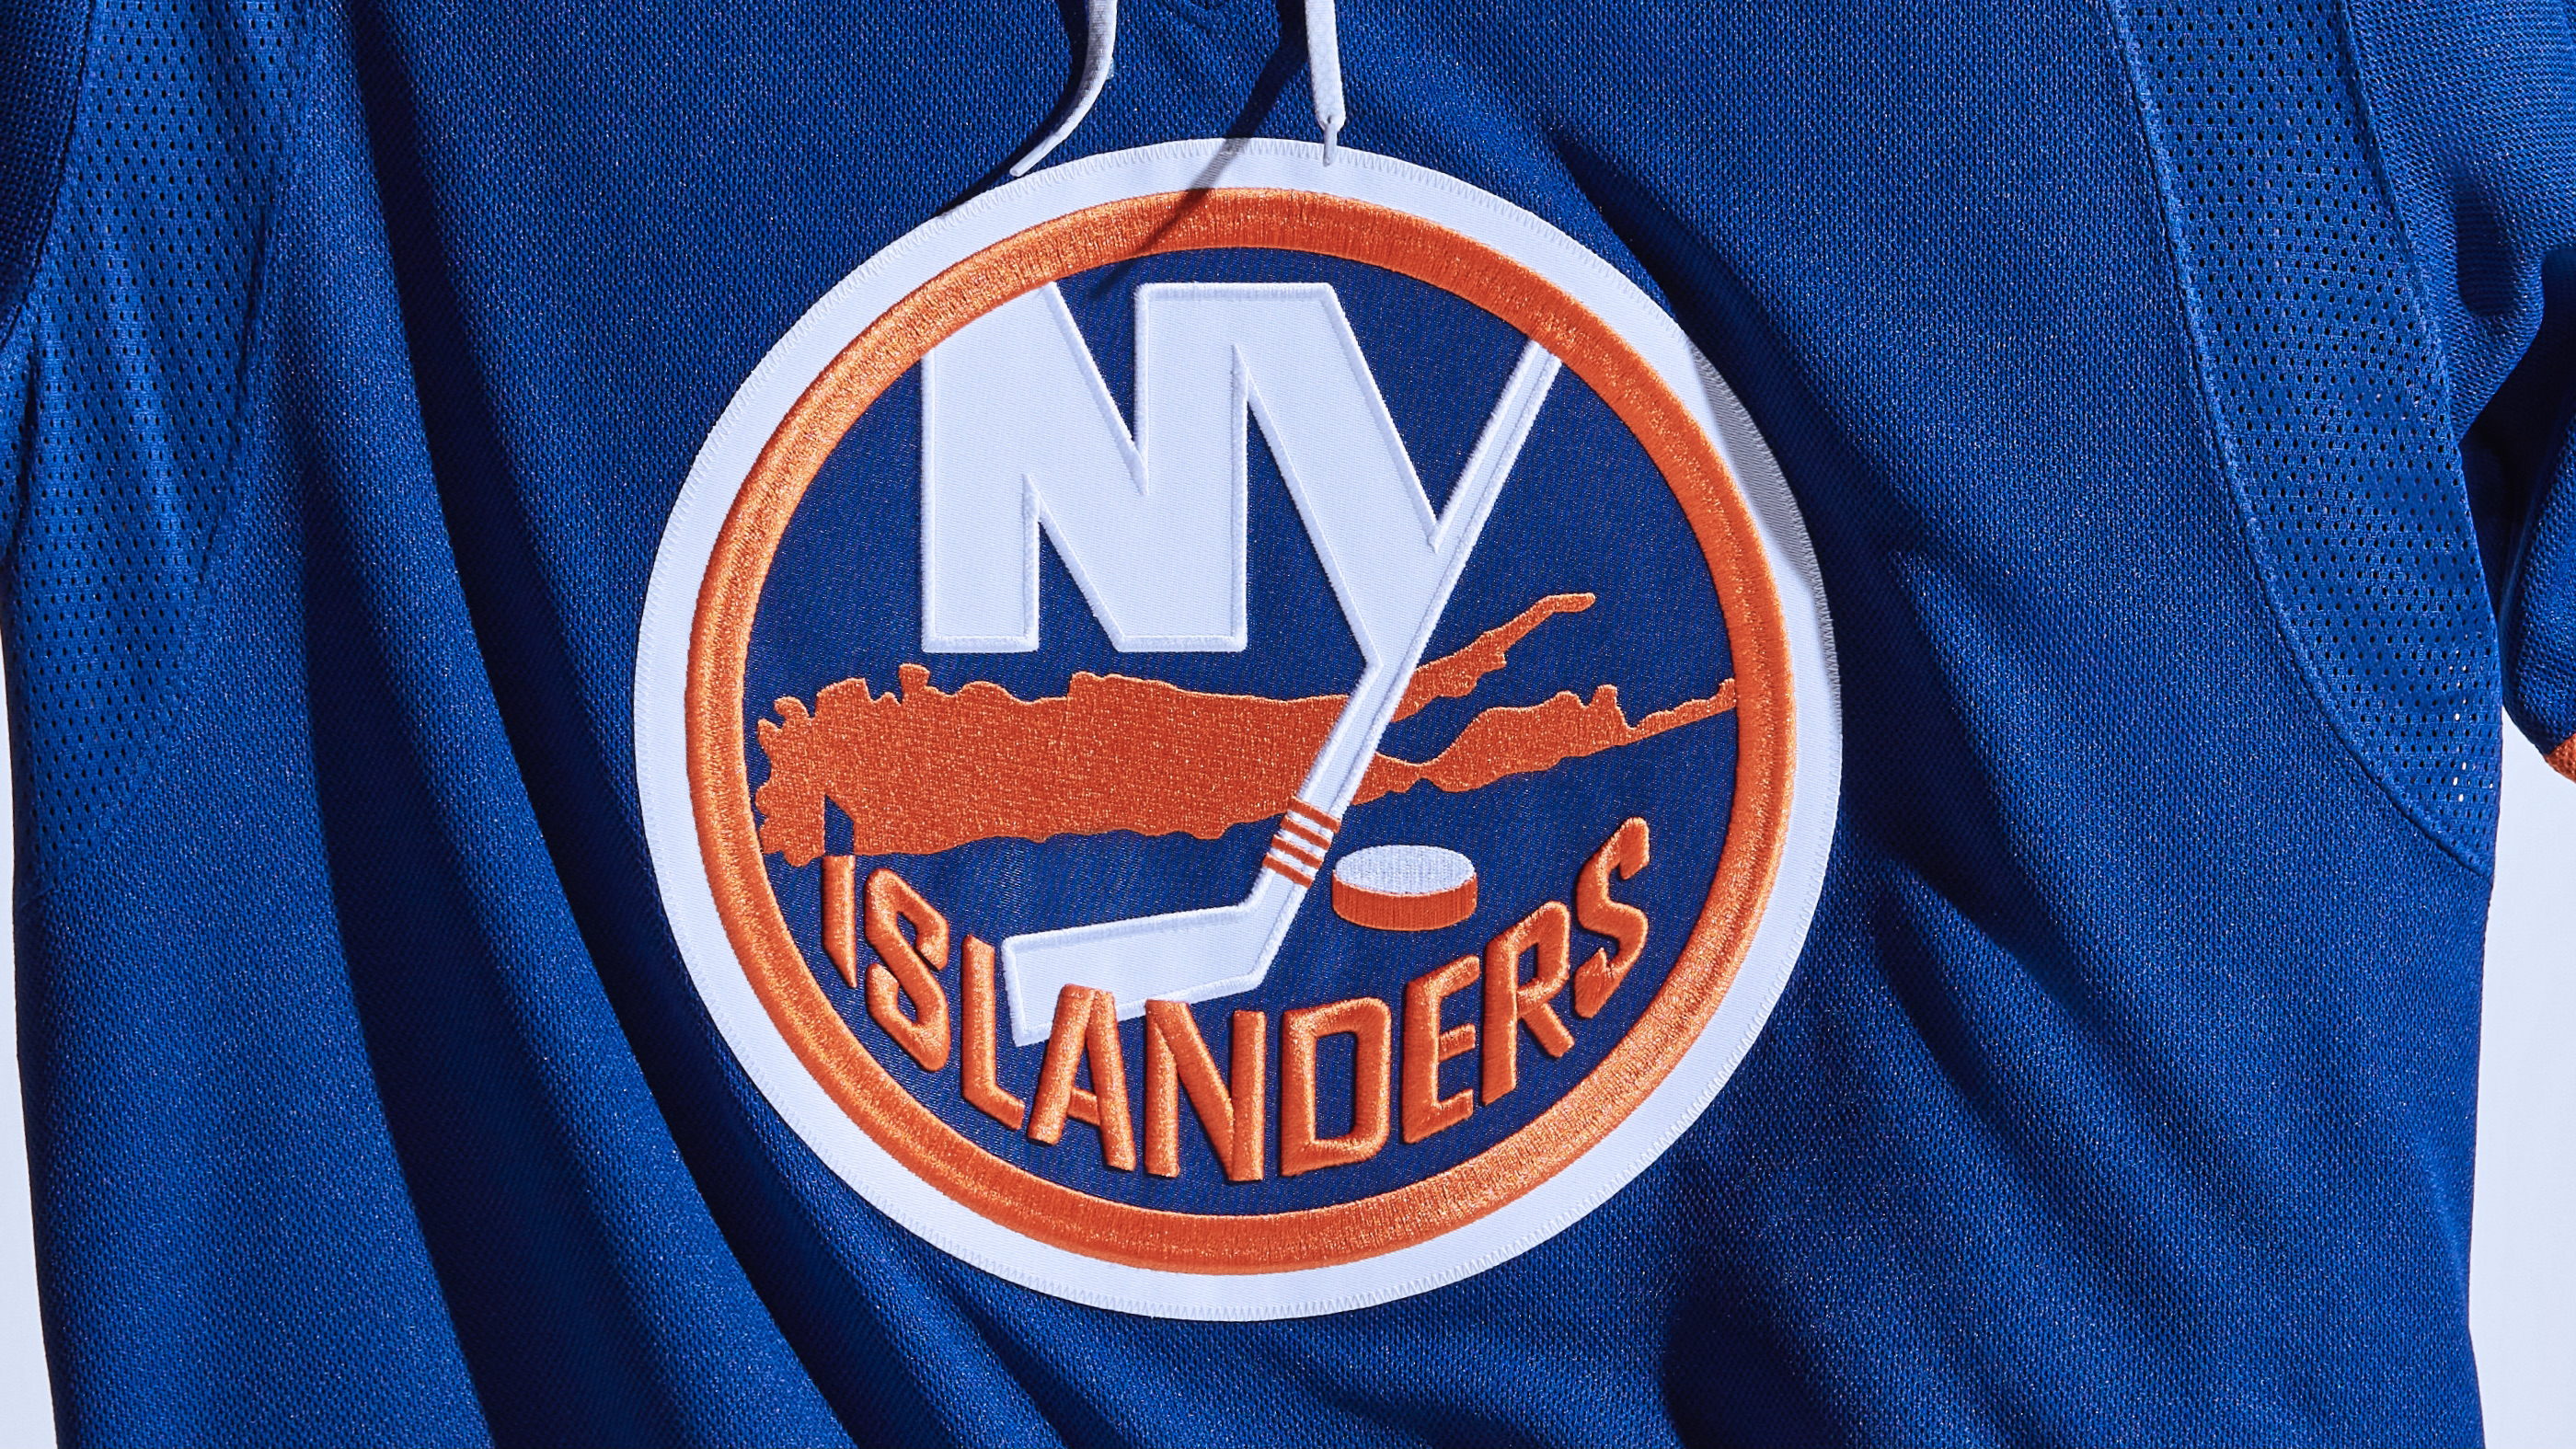 The New York Islanders' home blue uniform for the 2021-22 NHL season